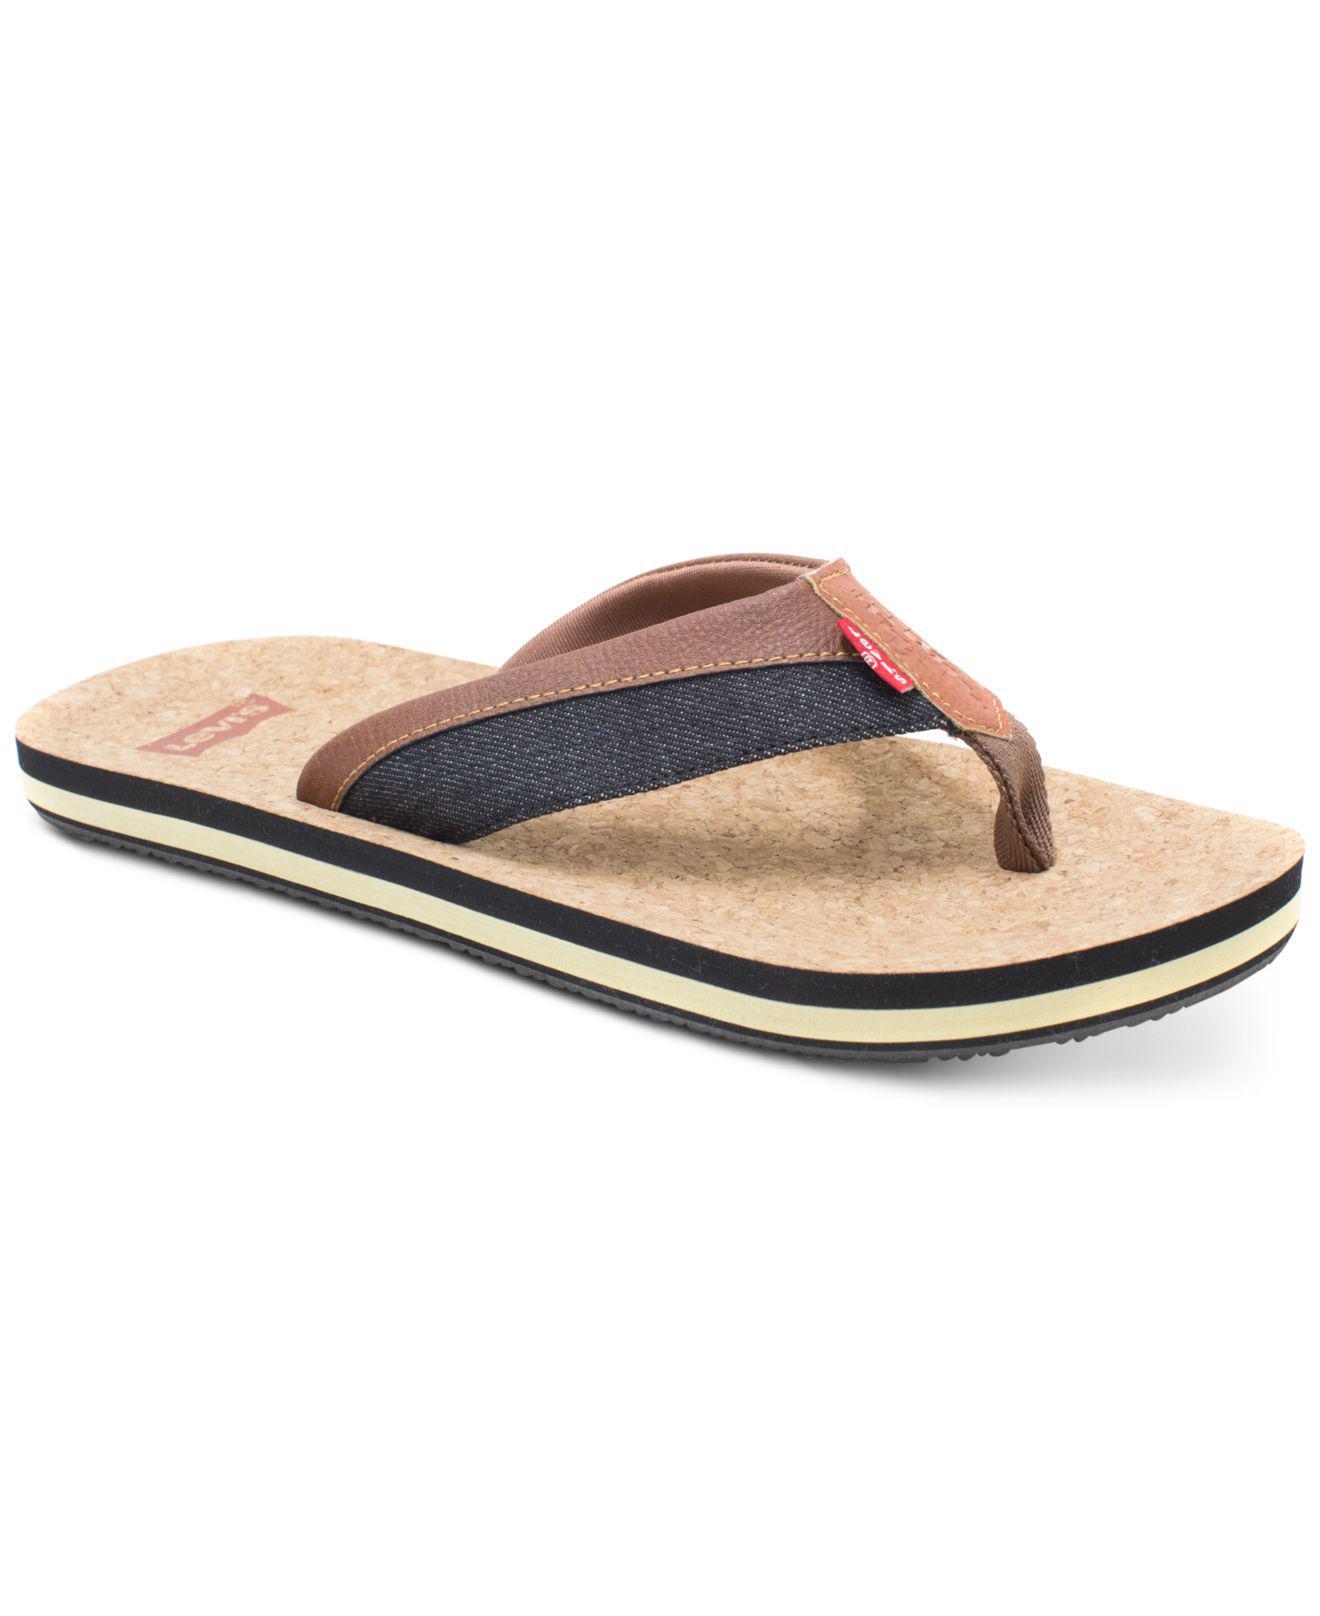 782ea79a743 Lyst - Levi s Vista Cork Flip Flops for Men